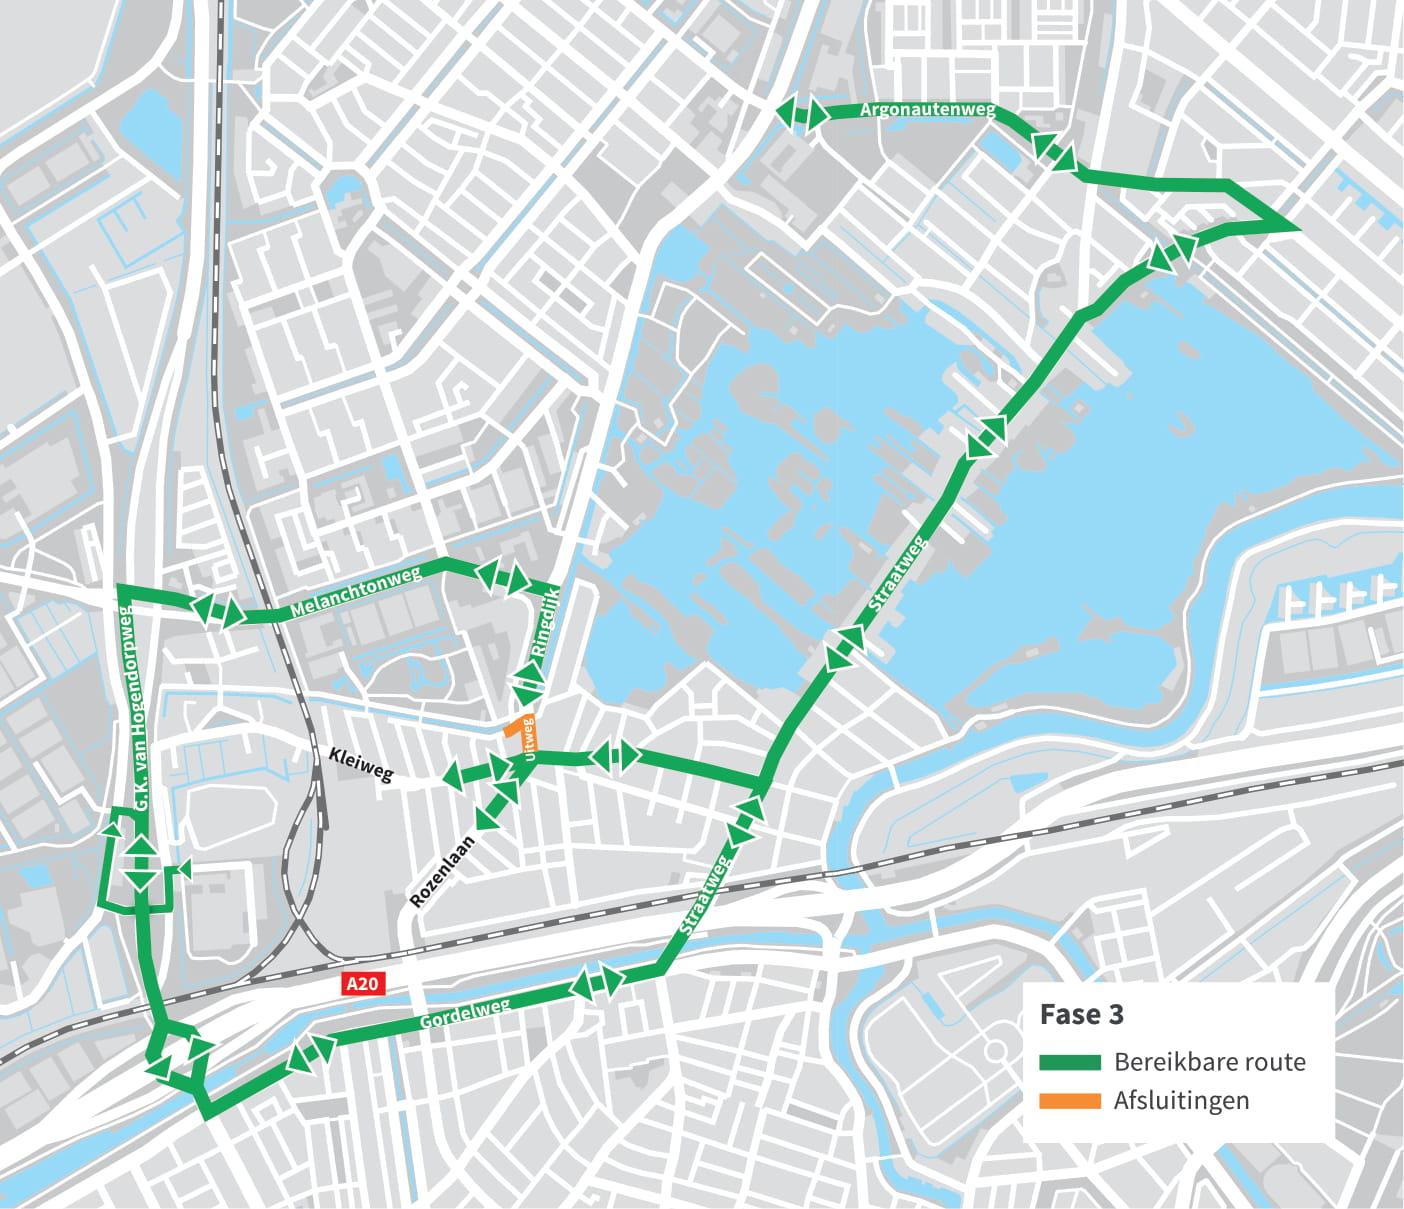 Rotterdamonderweg_afsluiting-kleiweg_fase3-1.jpg